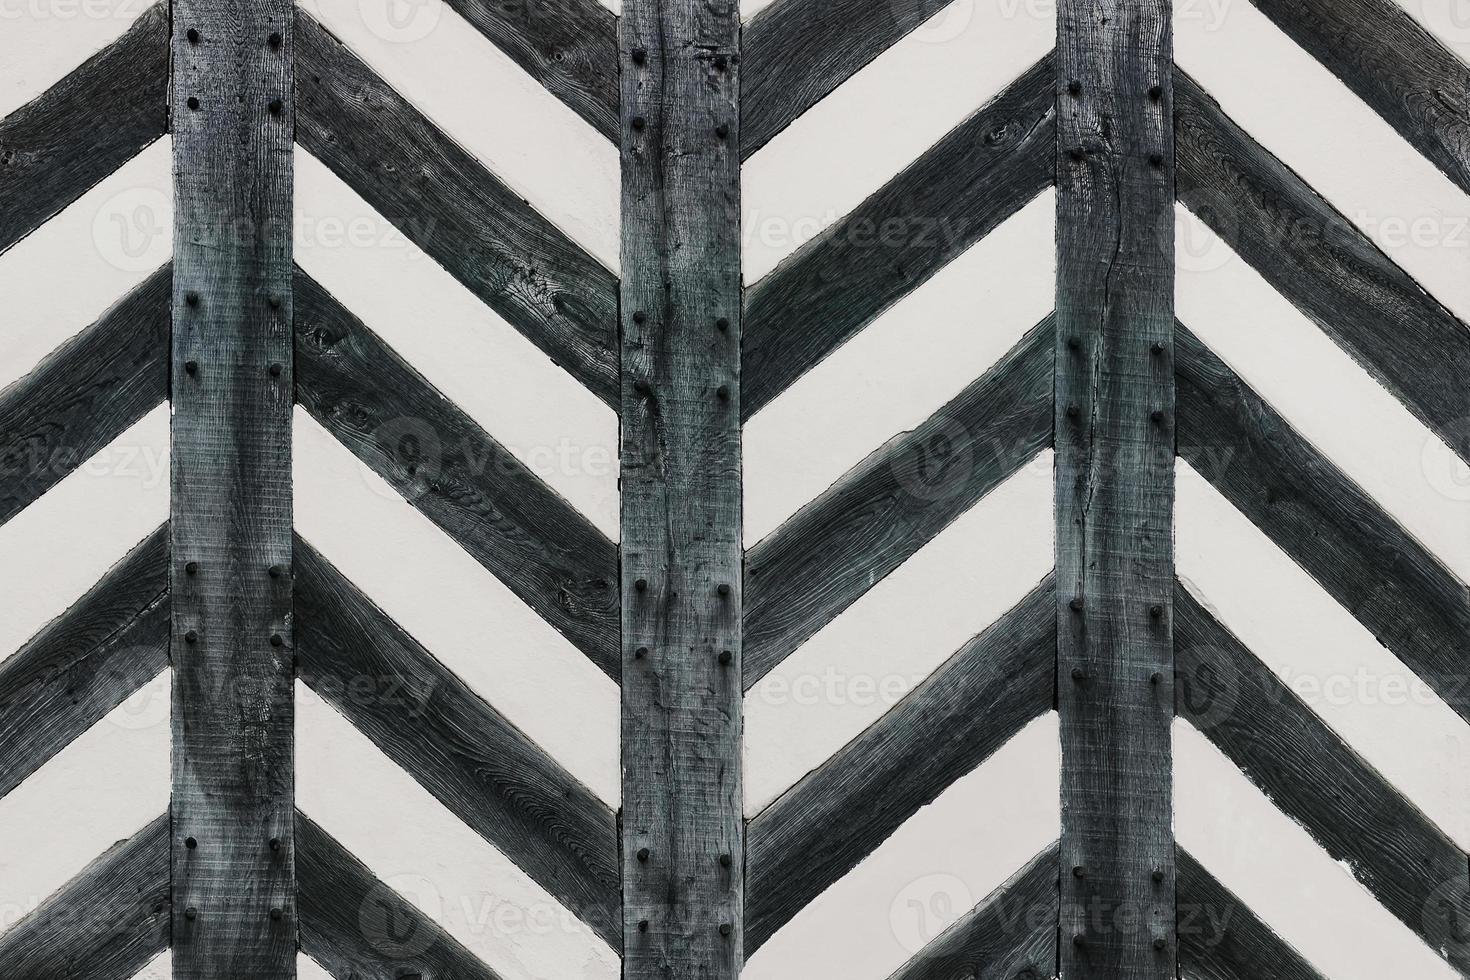 tudor huismuur half hout sterk hout zigzagvorm foto